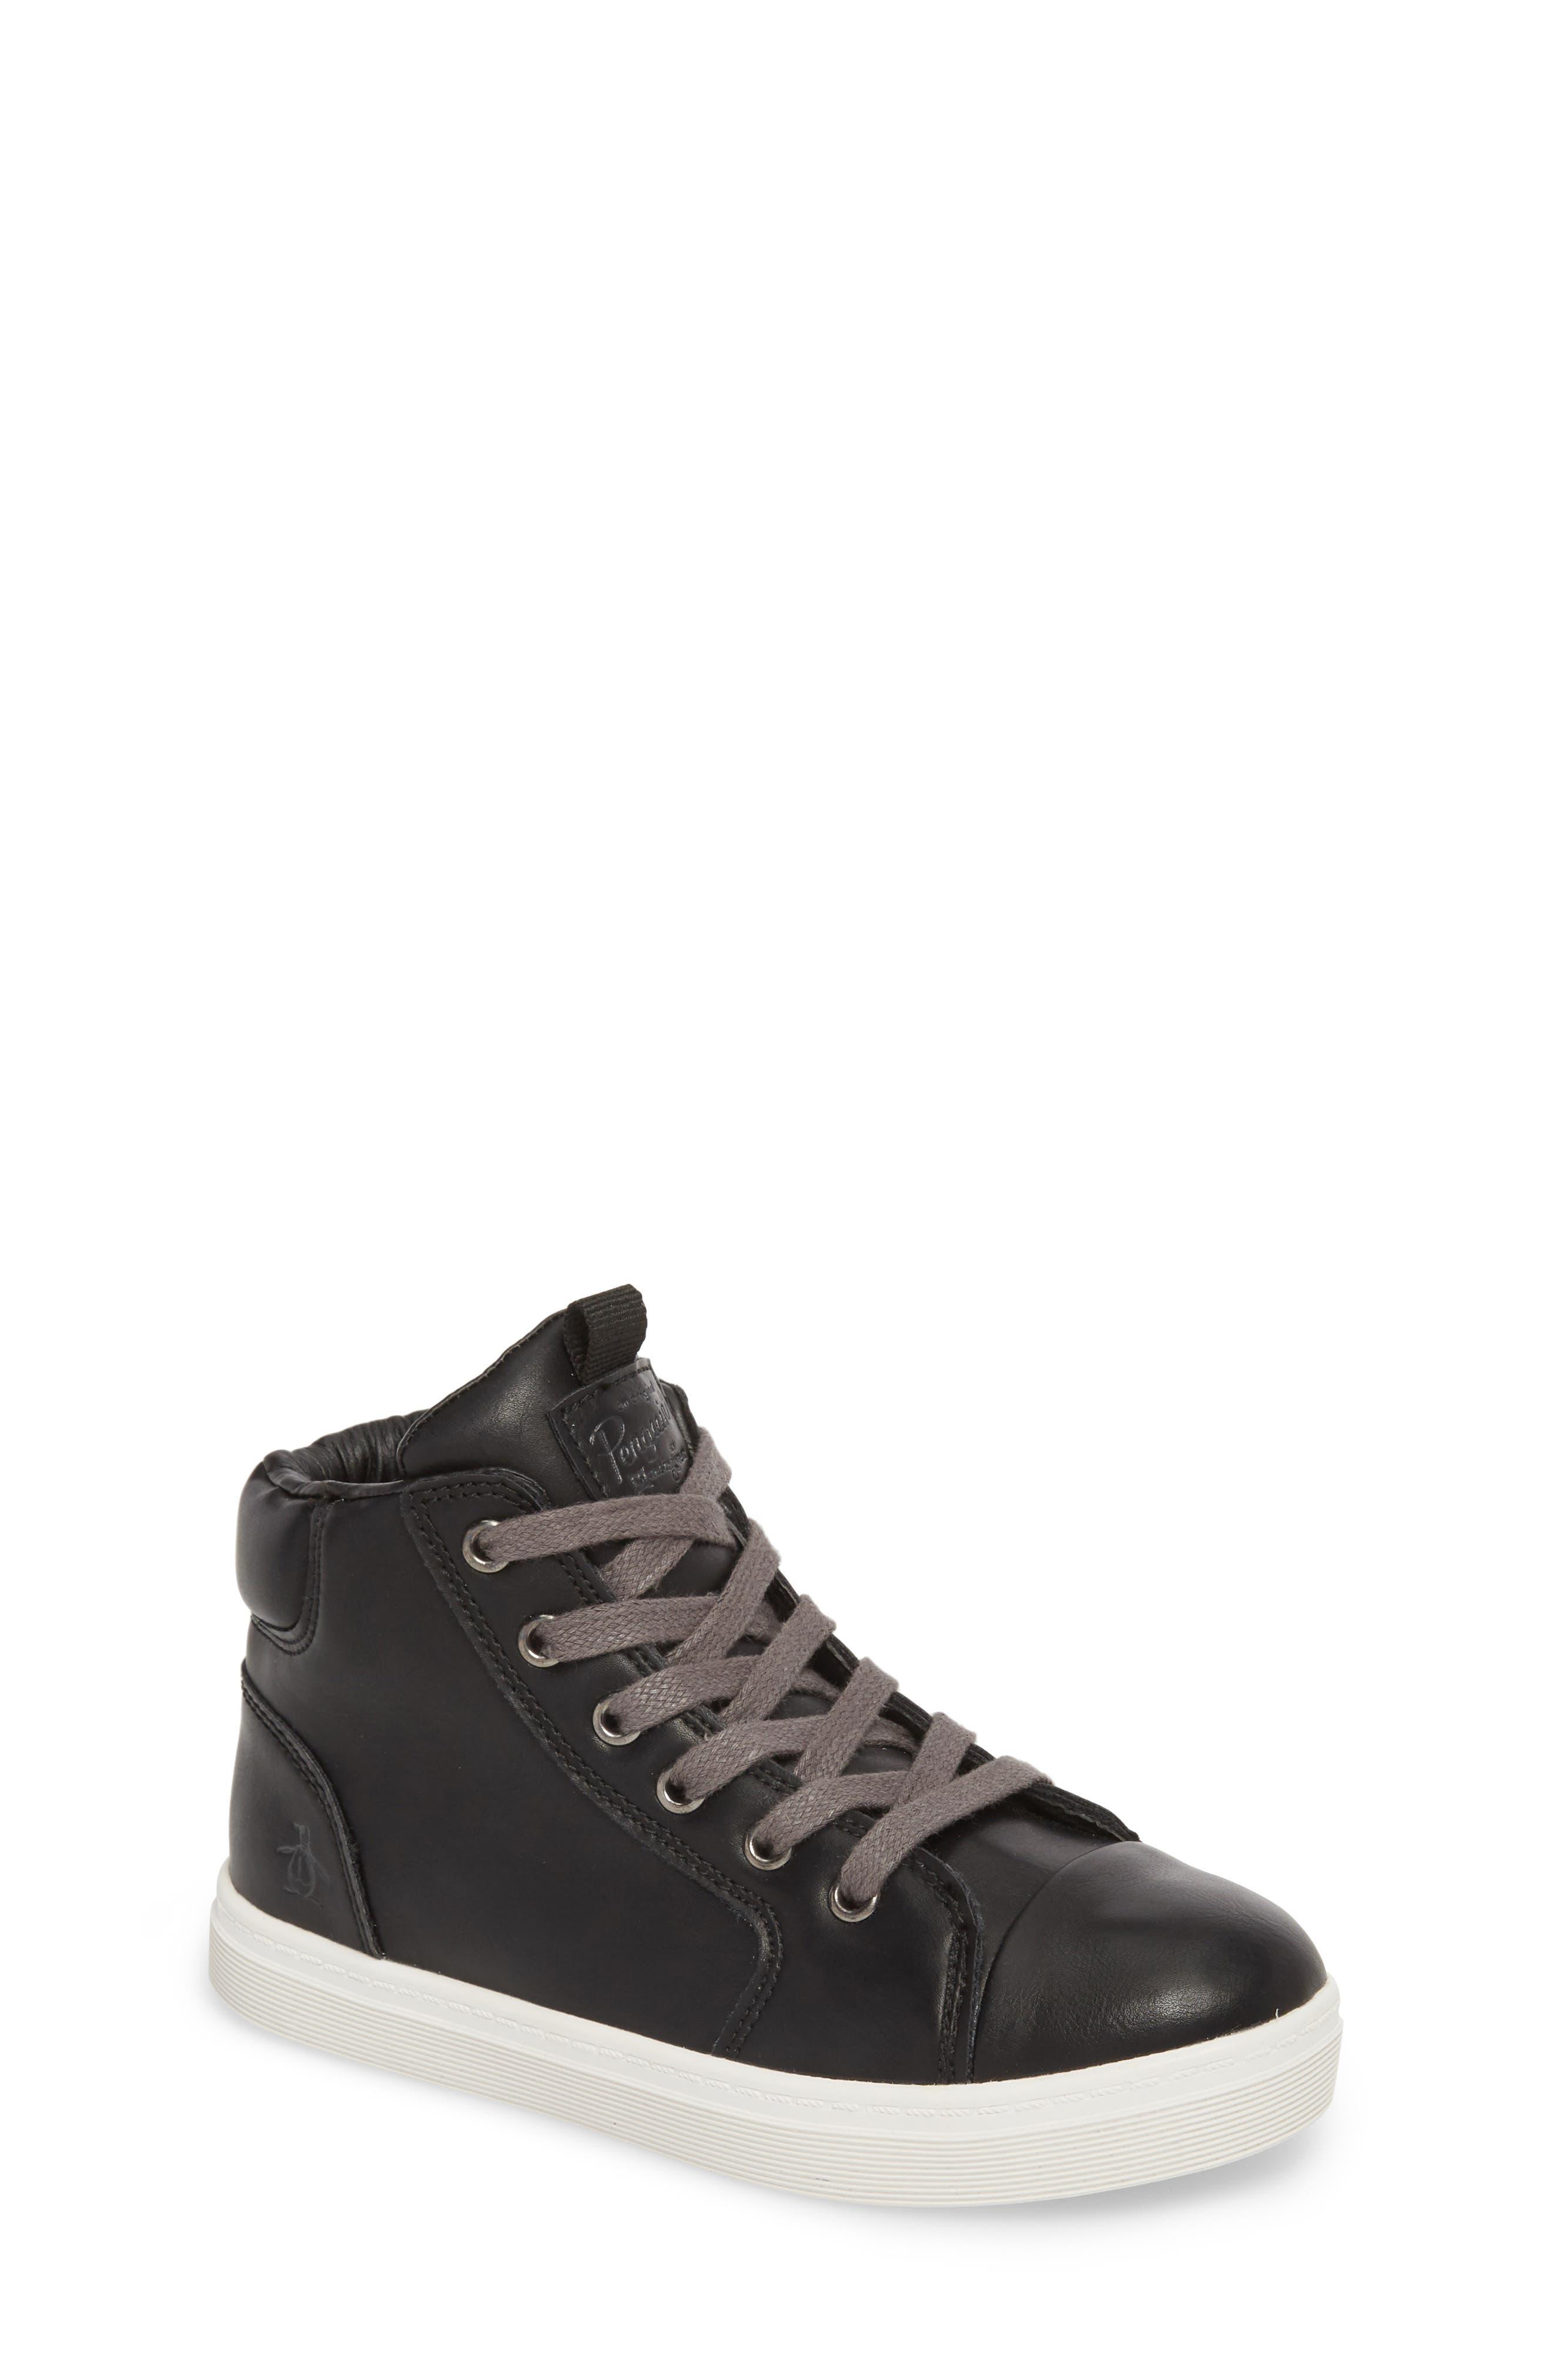 Carson High Top Sneaker,                         Main,                         color, BLACK